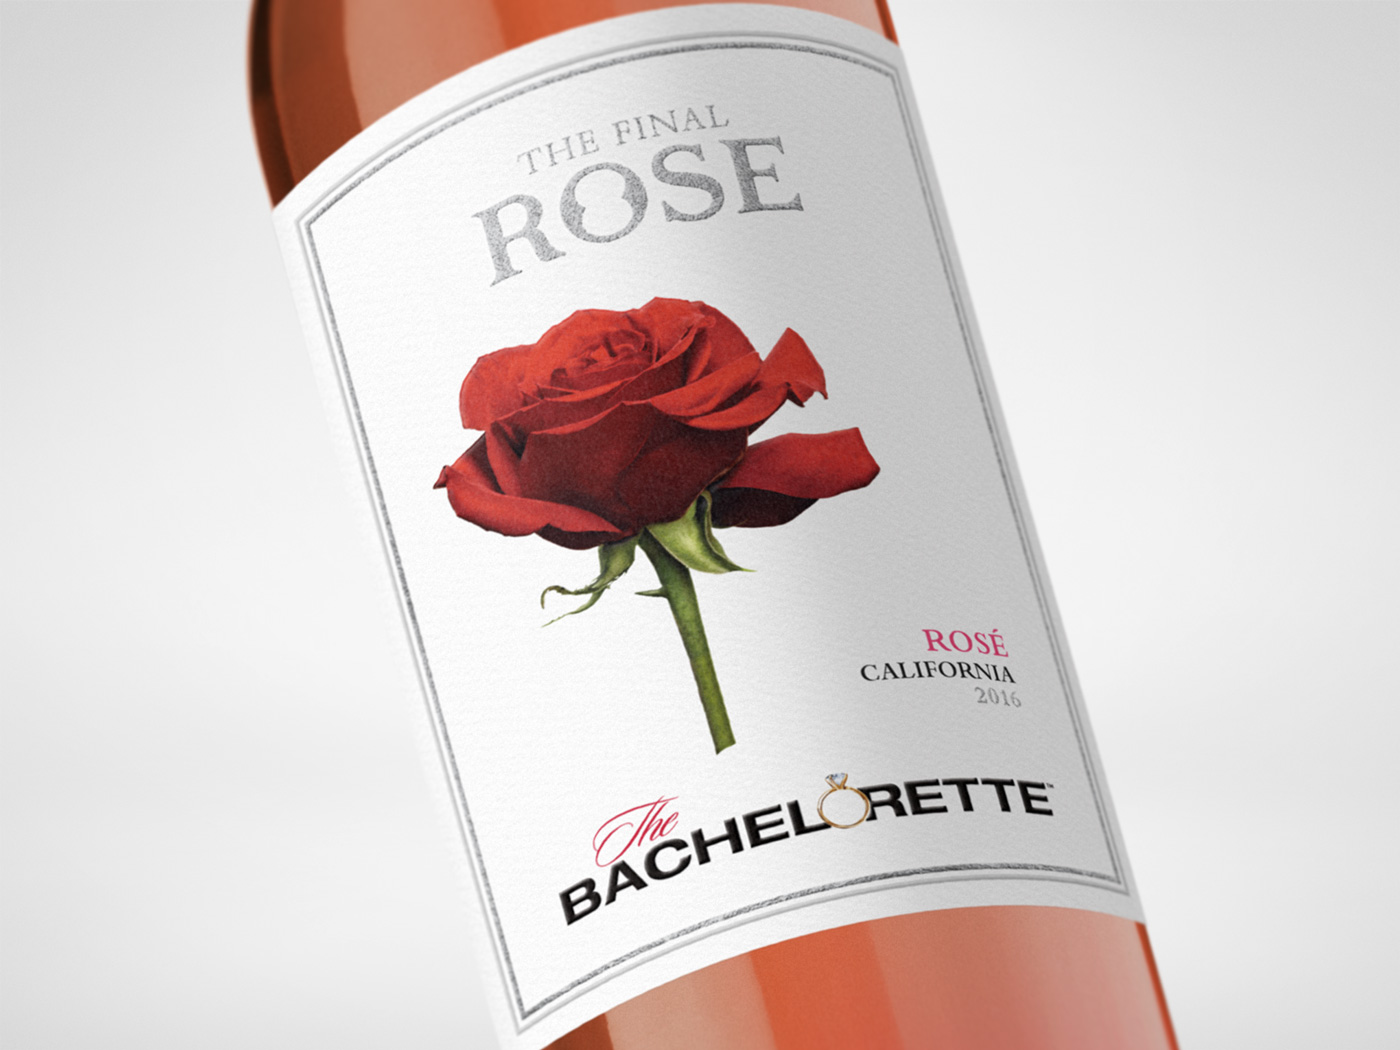 Bachelor Wines - The Final Rose Closeup